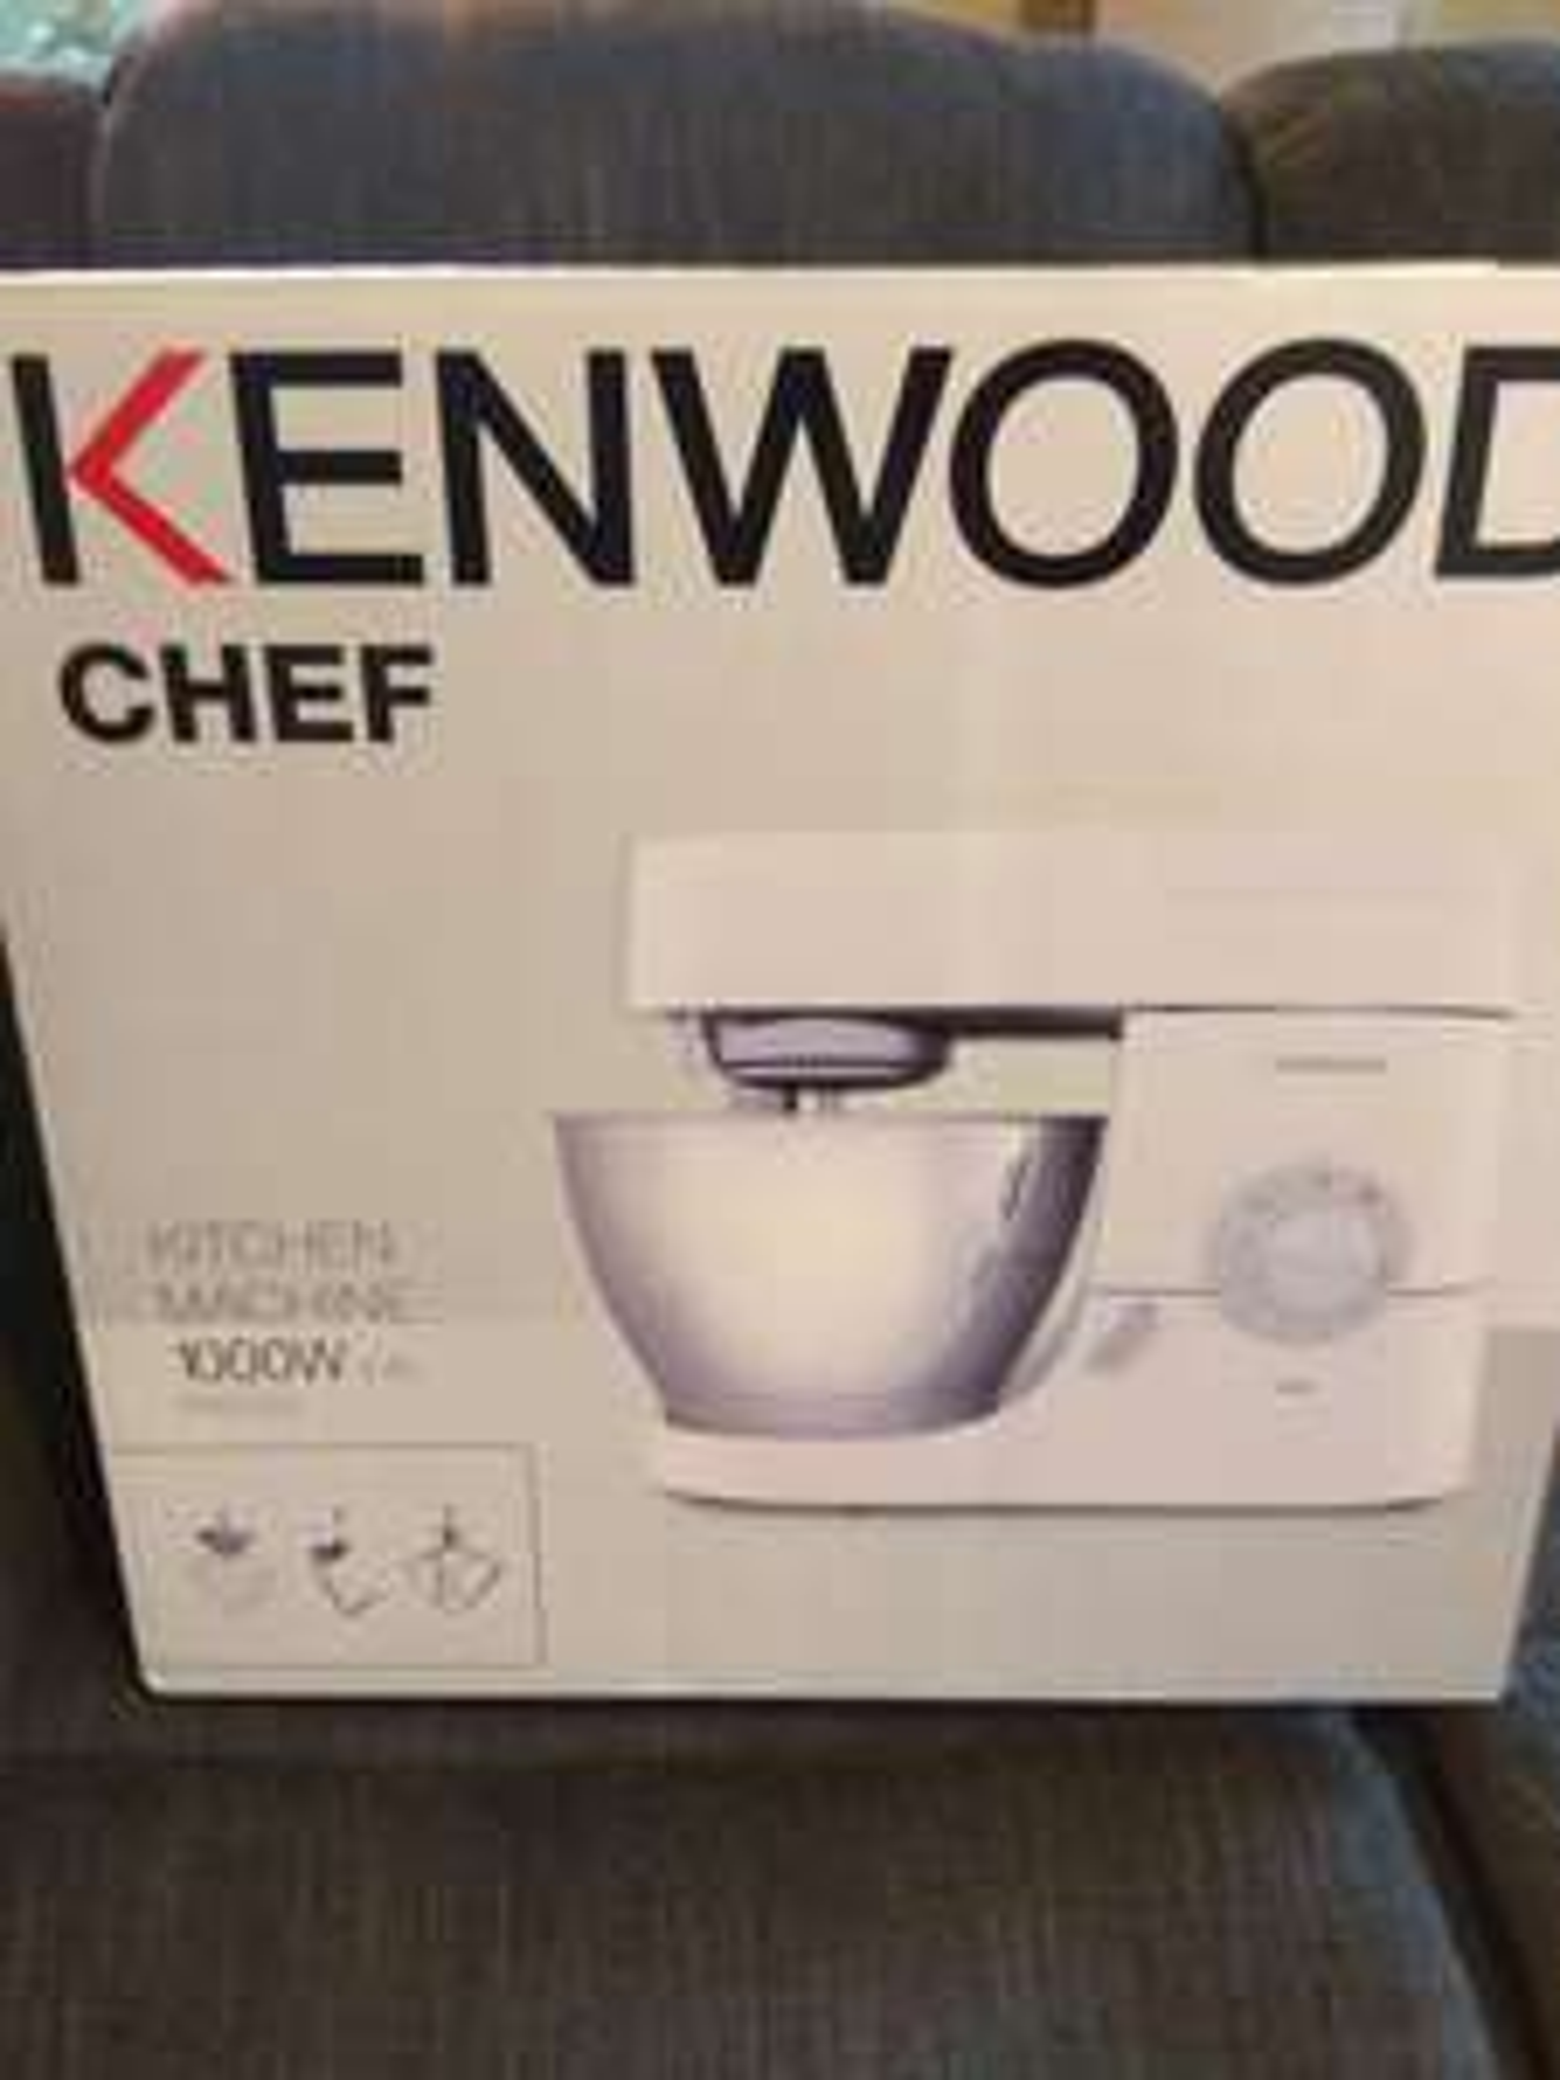 Kenwood Chef Food Mixer / Stand Mixer KMC515 £74.99 at Dunelm - Bournemouth